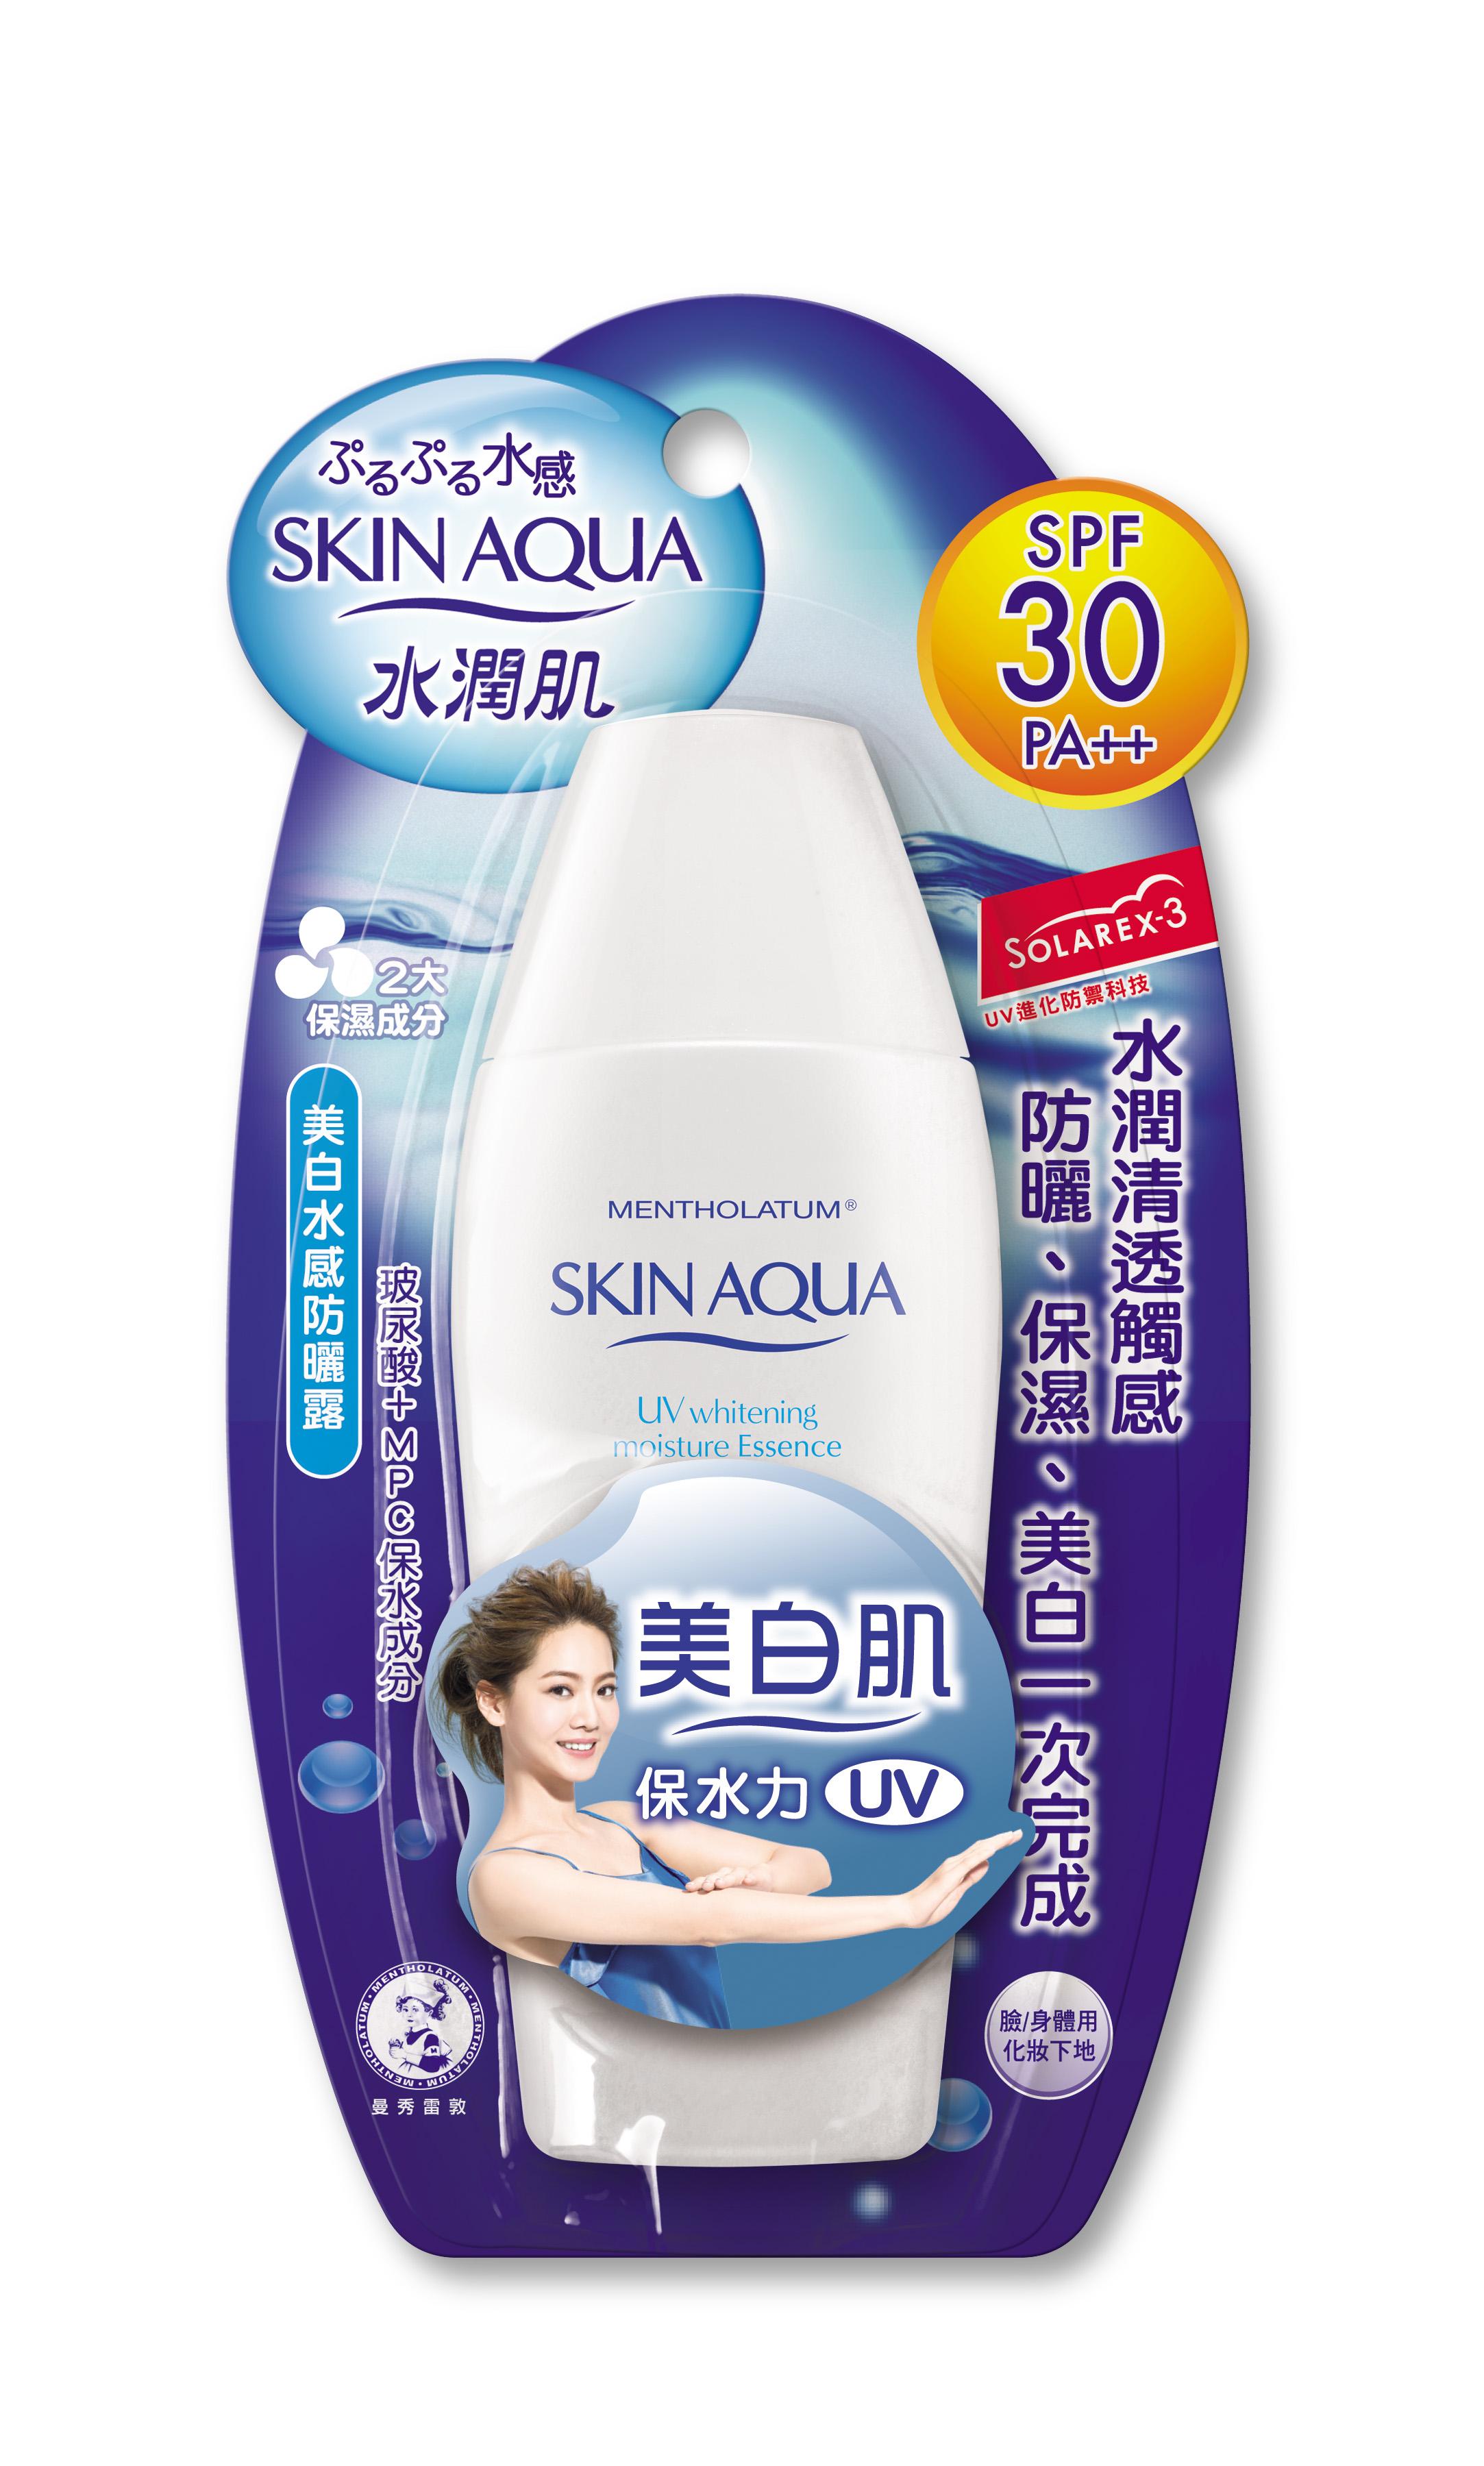 SKINAQUA水潤肌超保濕水感防曬露 背卡-0124 fa-OL